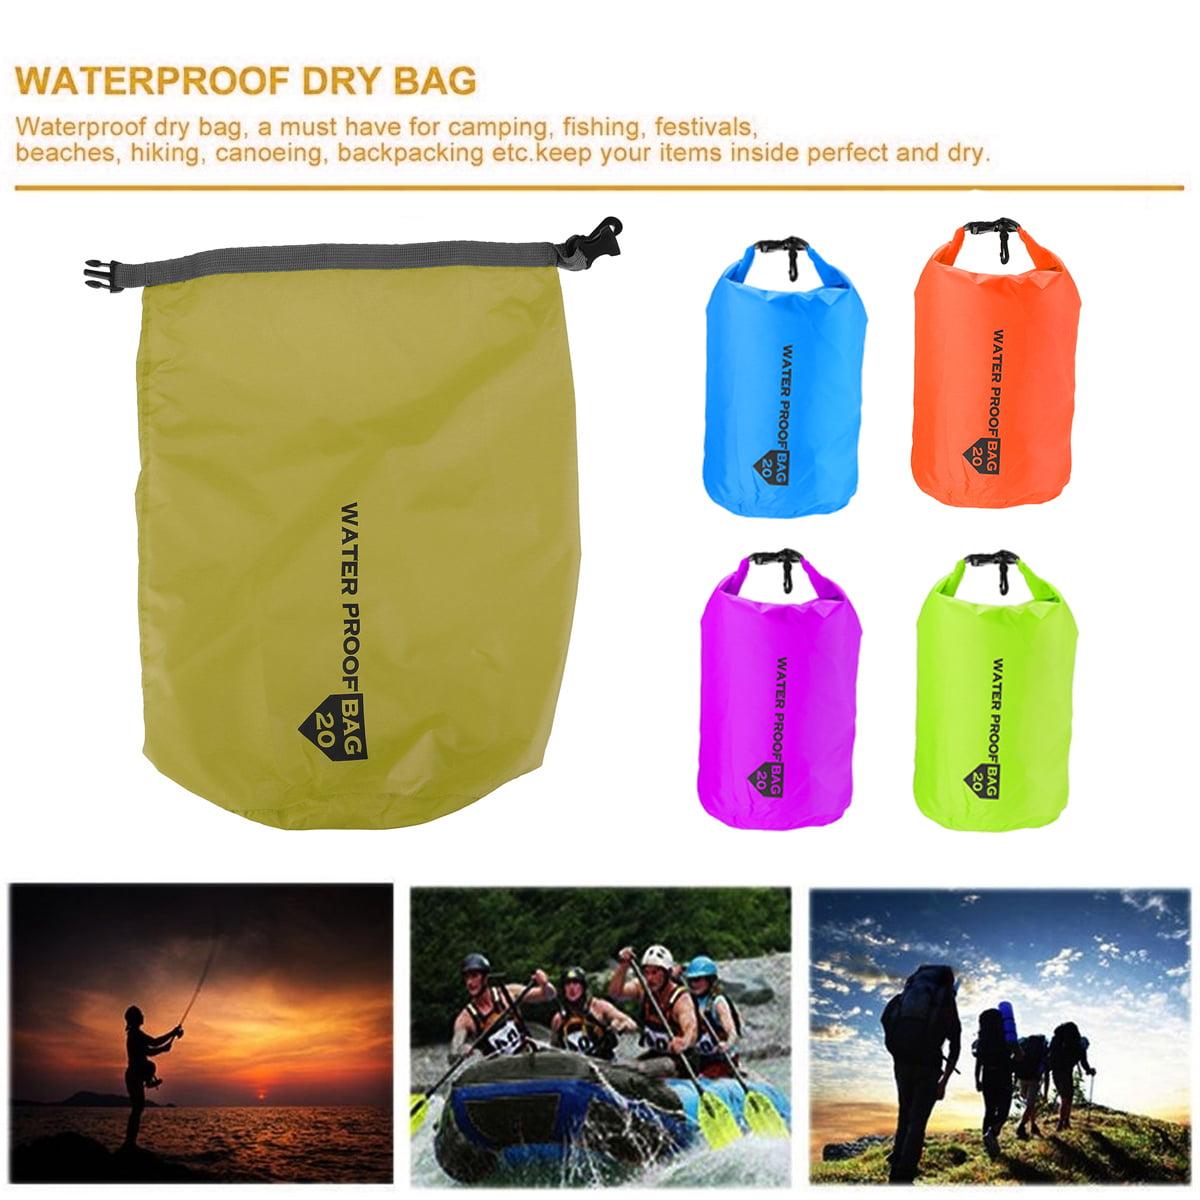 100/% Waterproof DRY BAG Sack Canoe Kayak Camping Hiking Sailing Fishing 20-70L